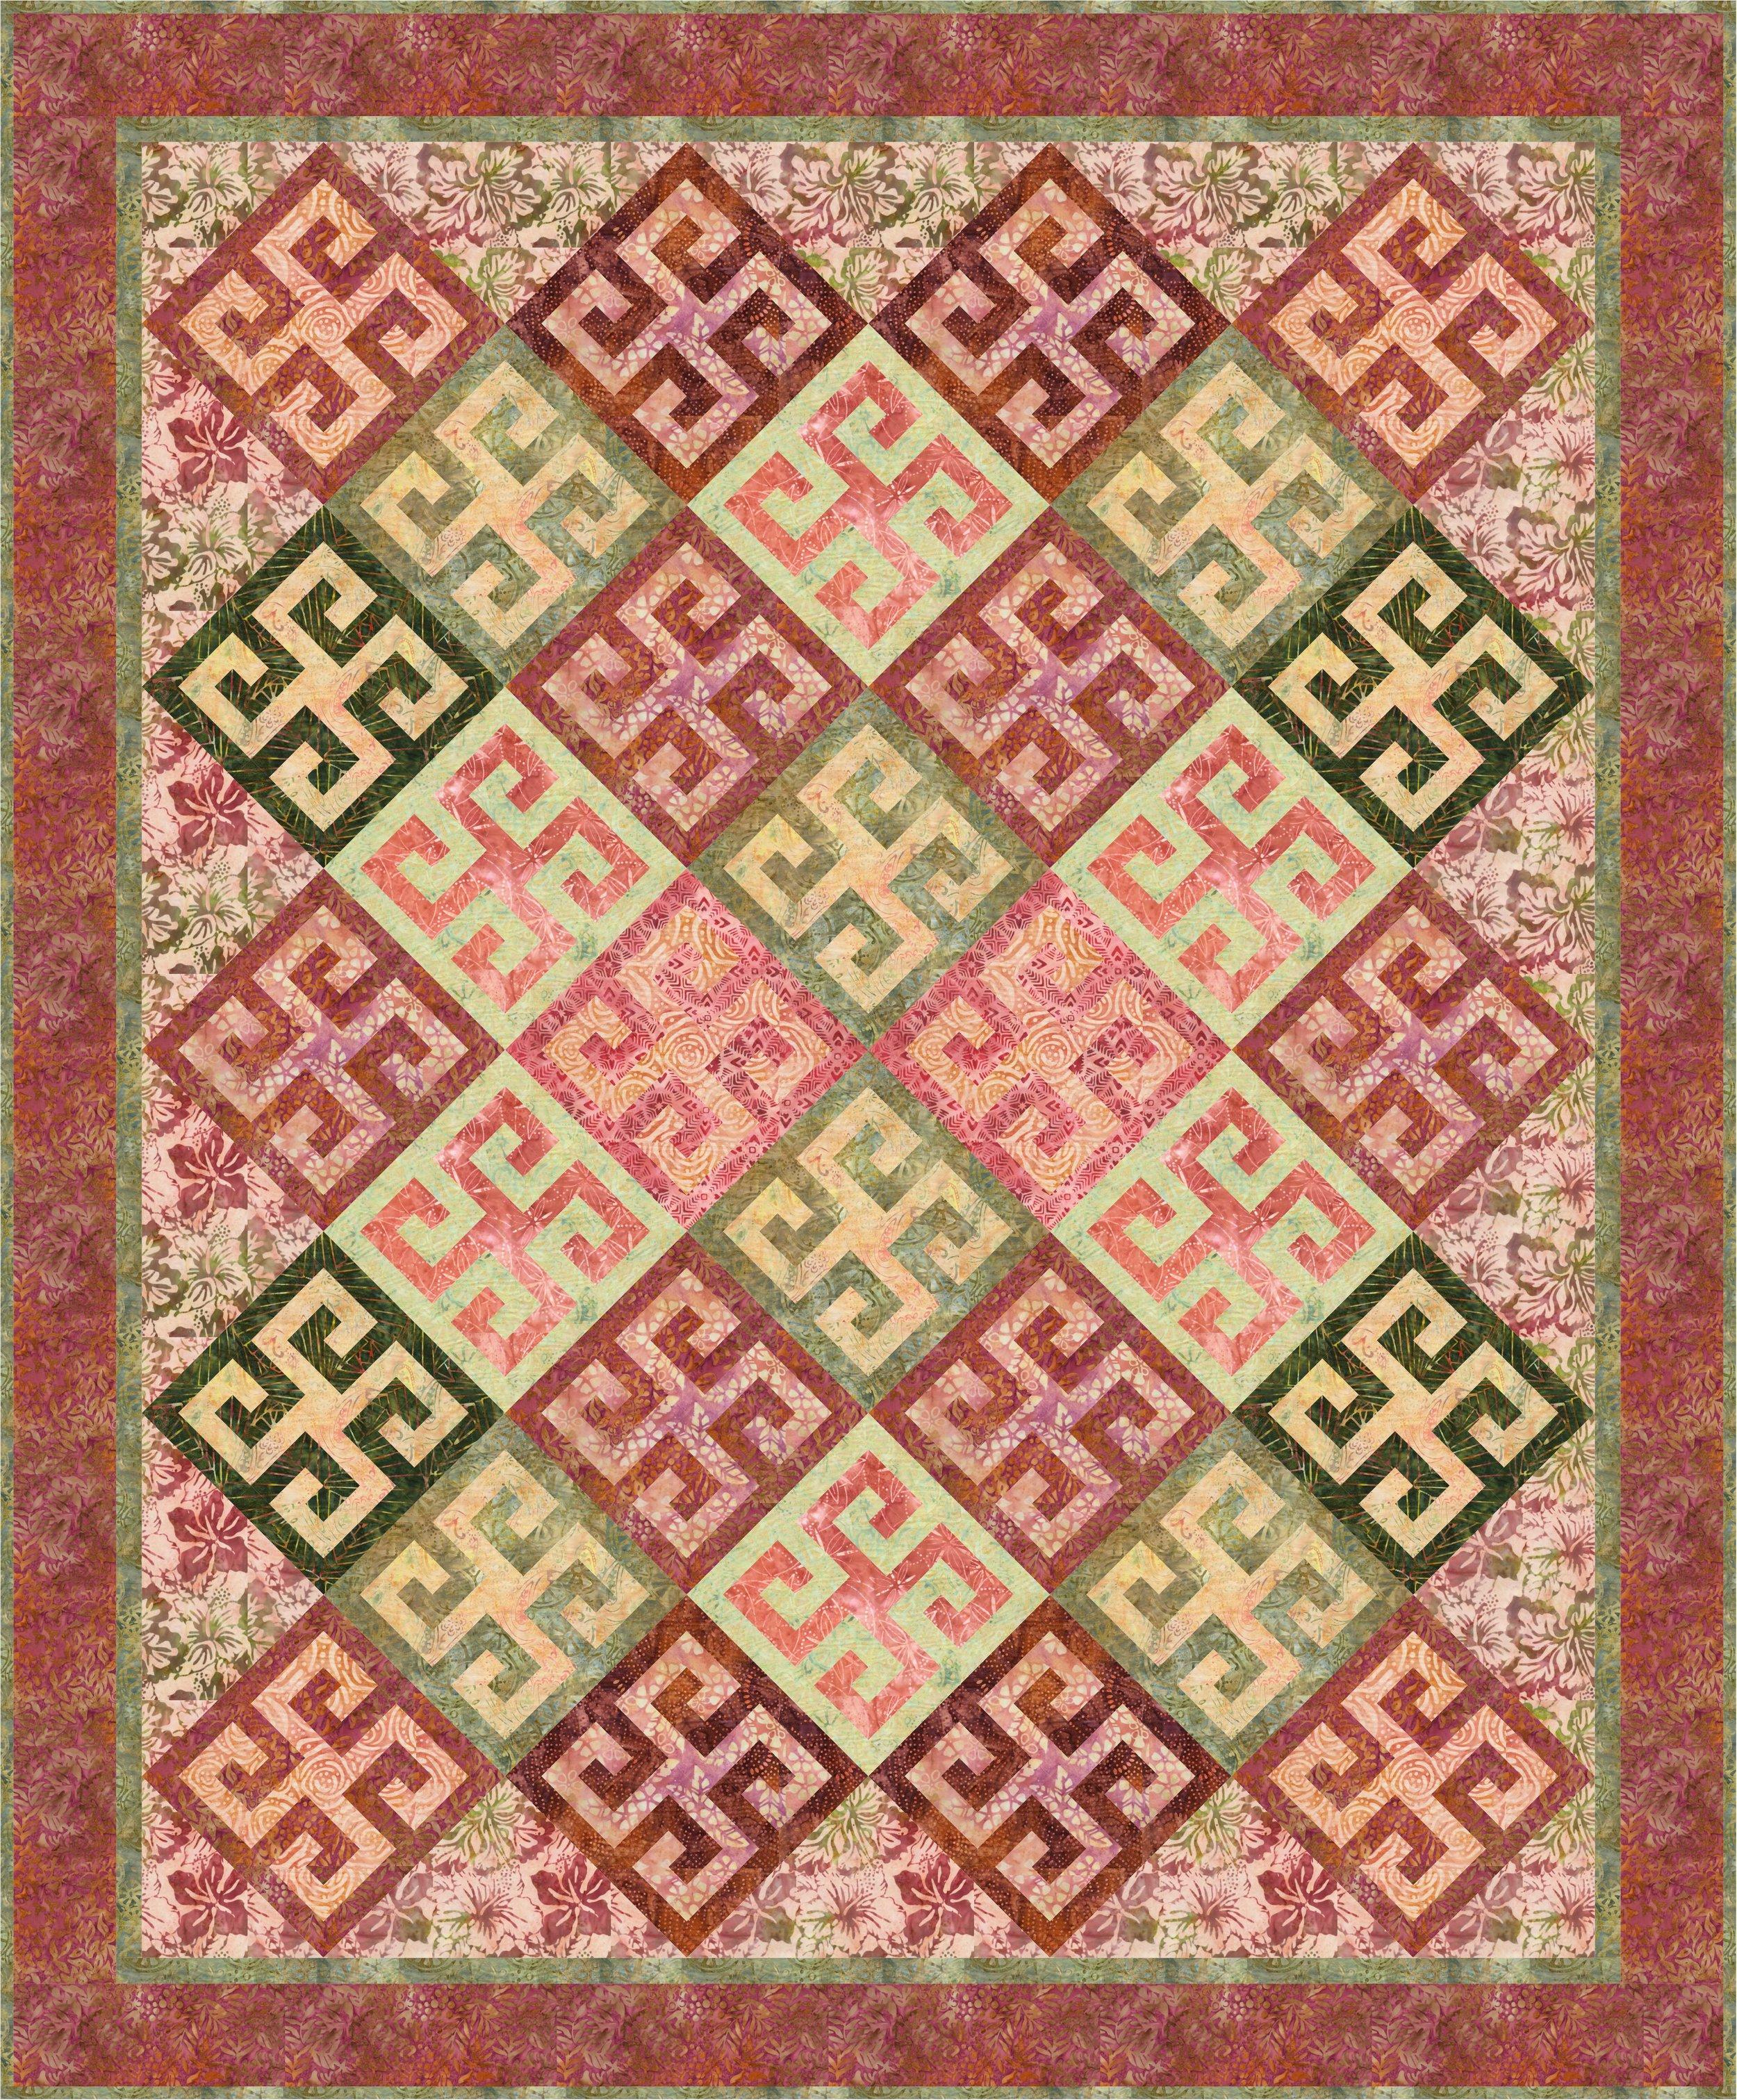 Tonga Posey-Jennifer Fulton - Greek Mosaic 67x81.JPG